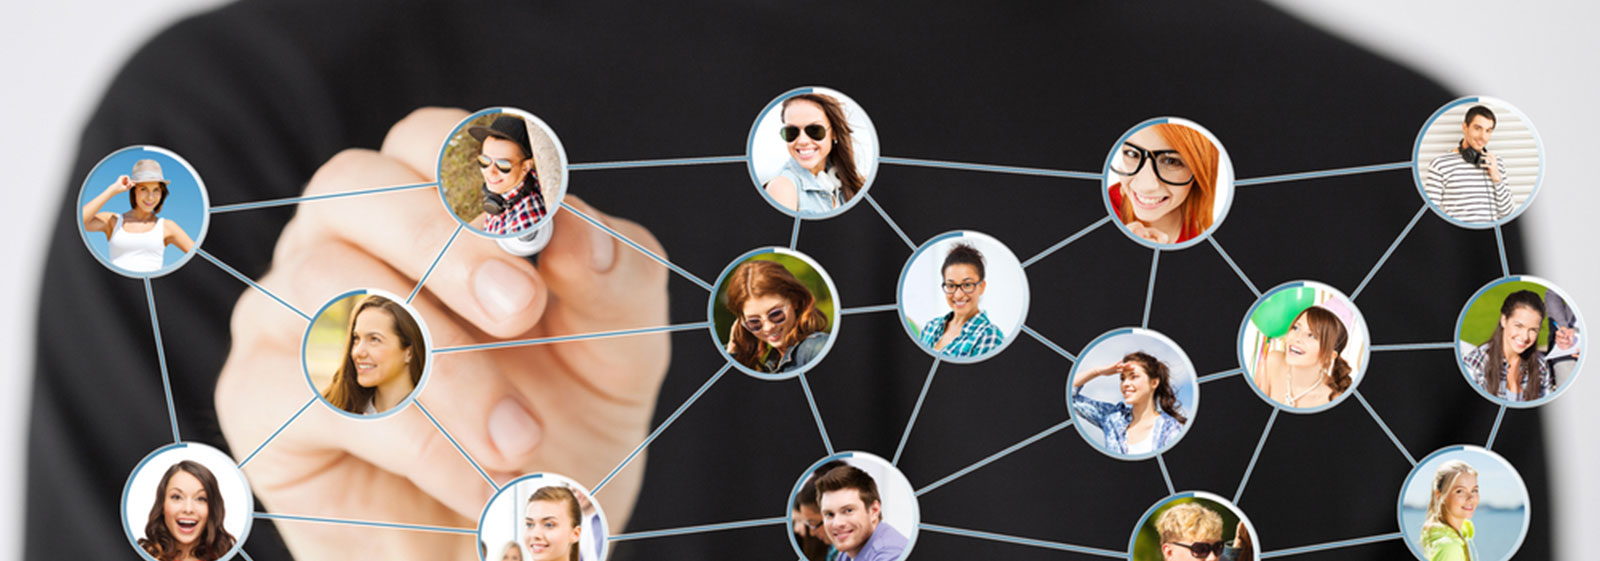 9 Cross-Promotional Marketing Ideas